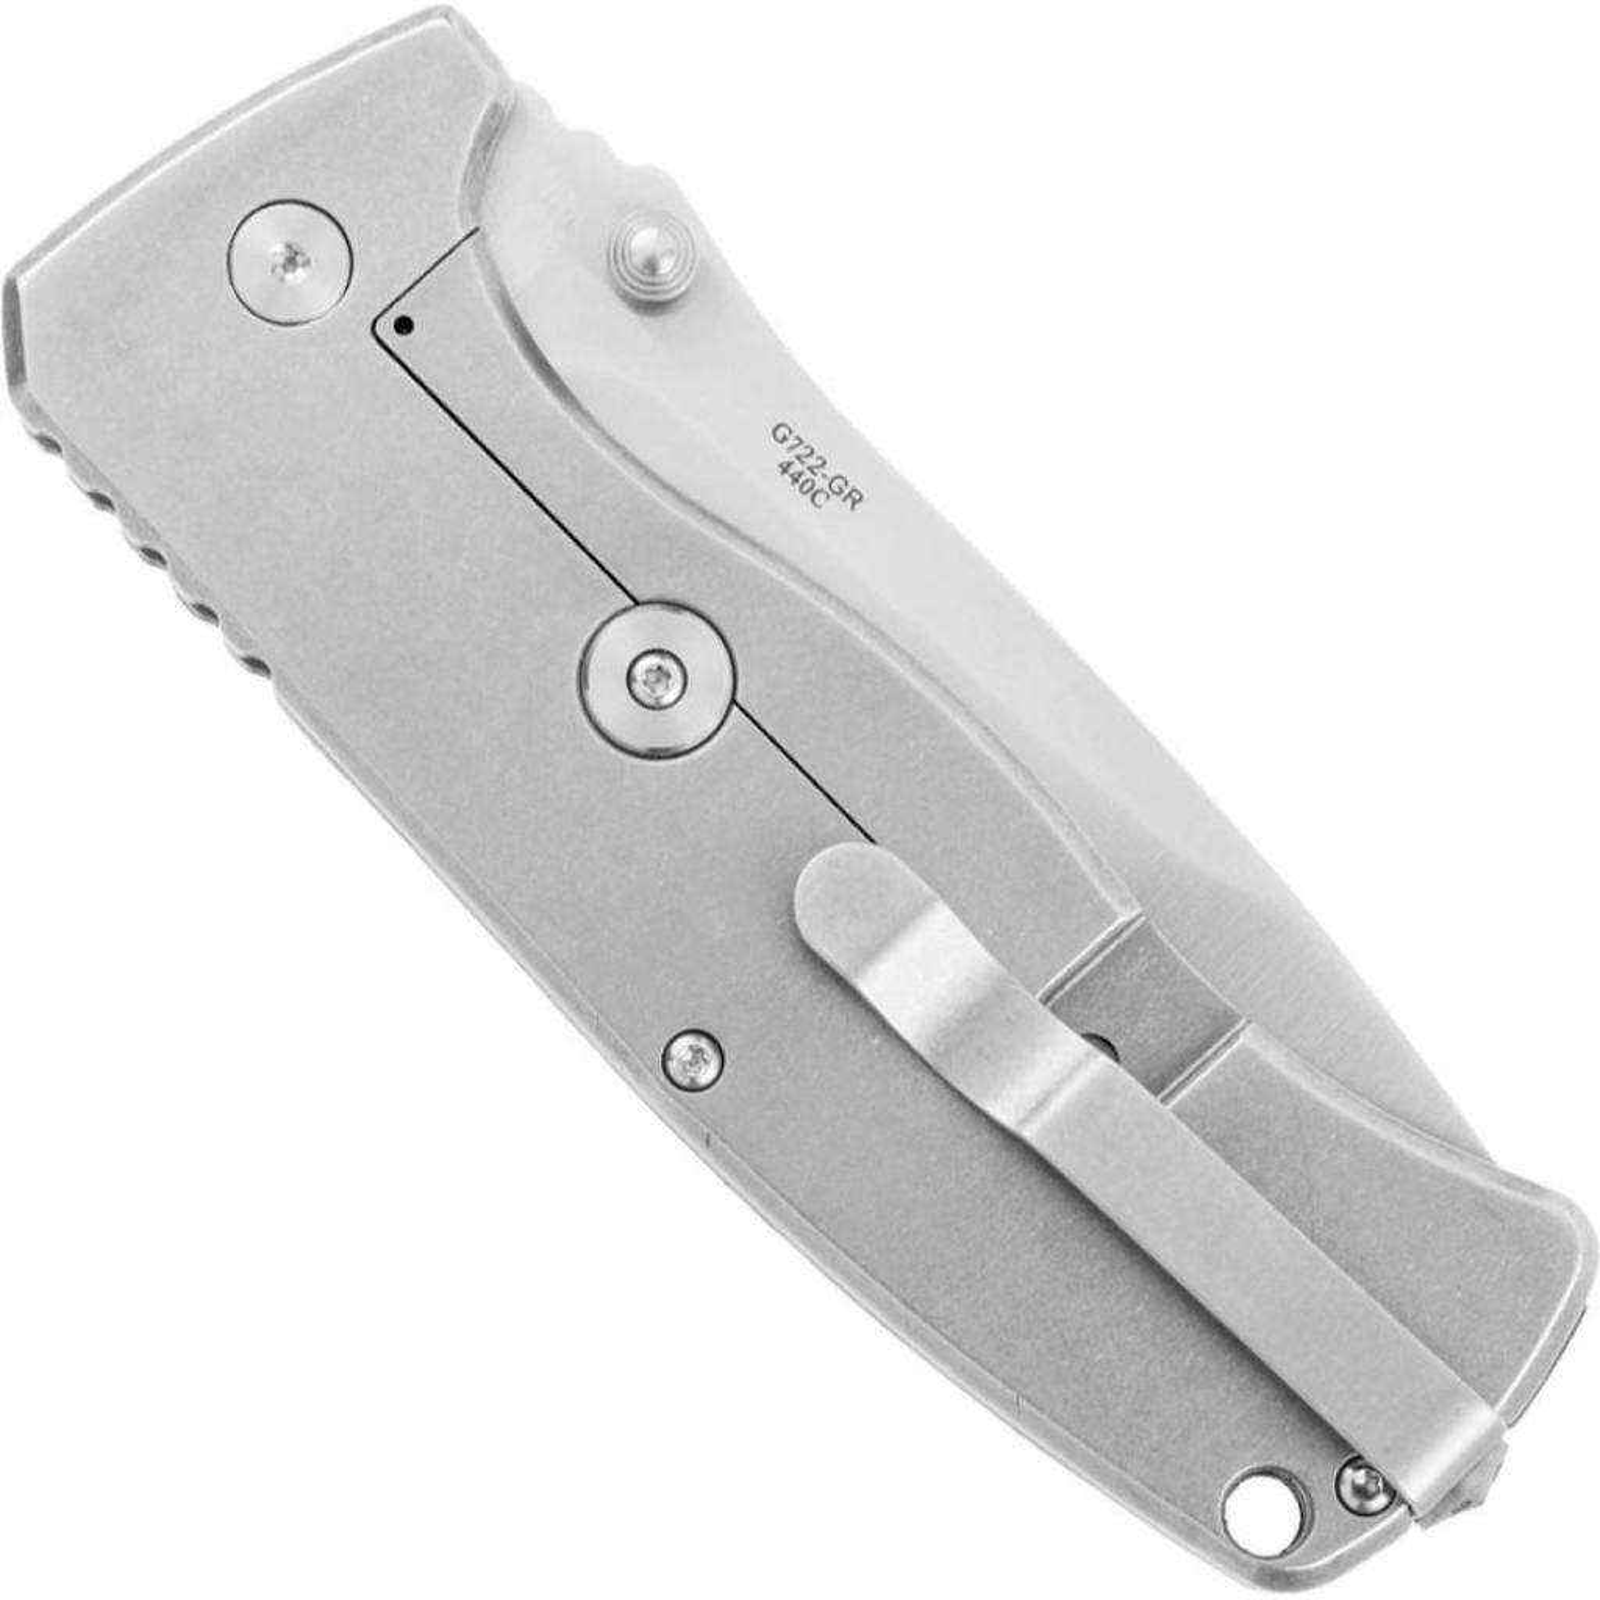 Нож Ganzo G722 оранж (G722-OR) изображение 6